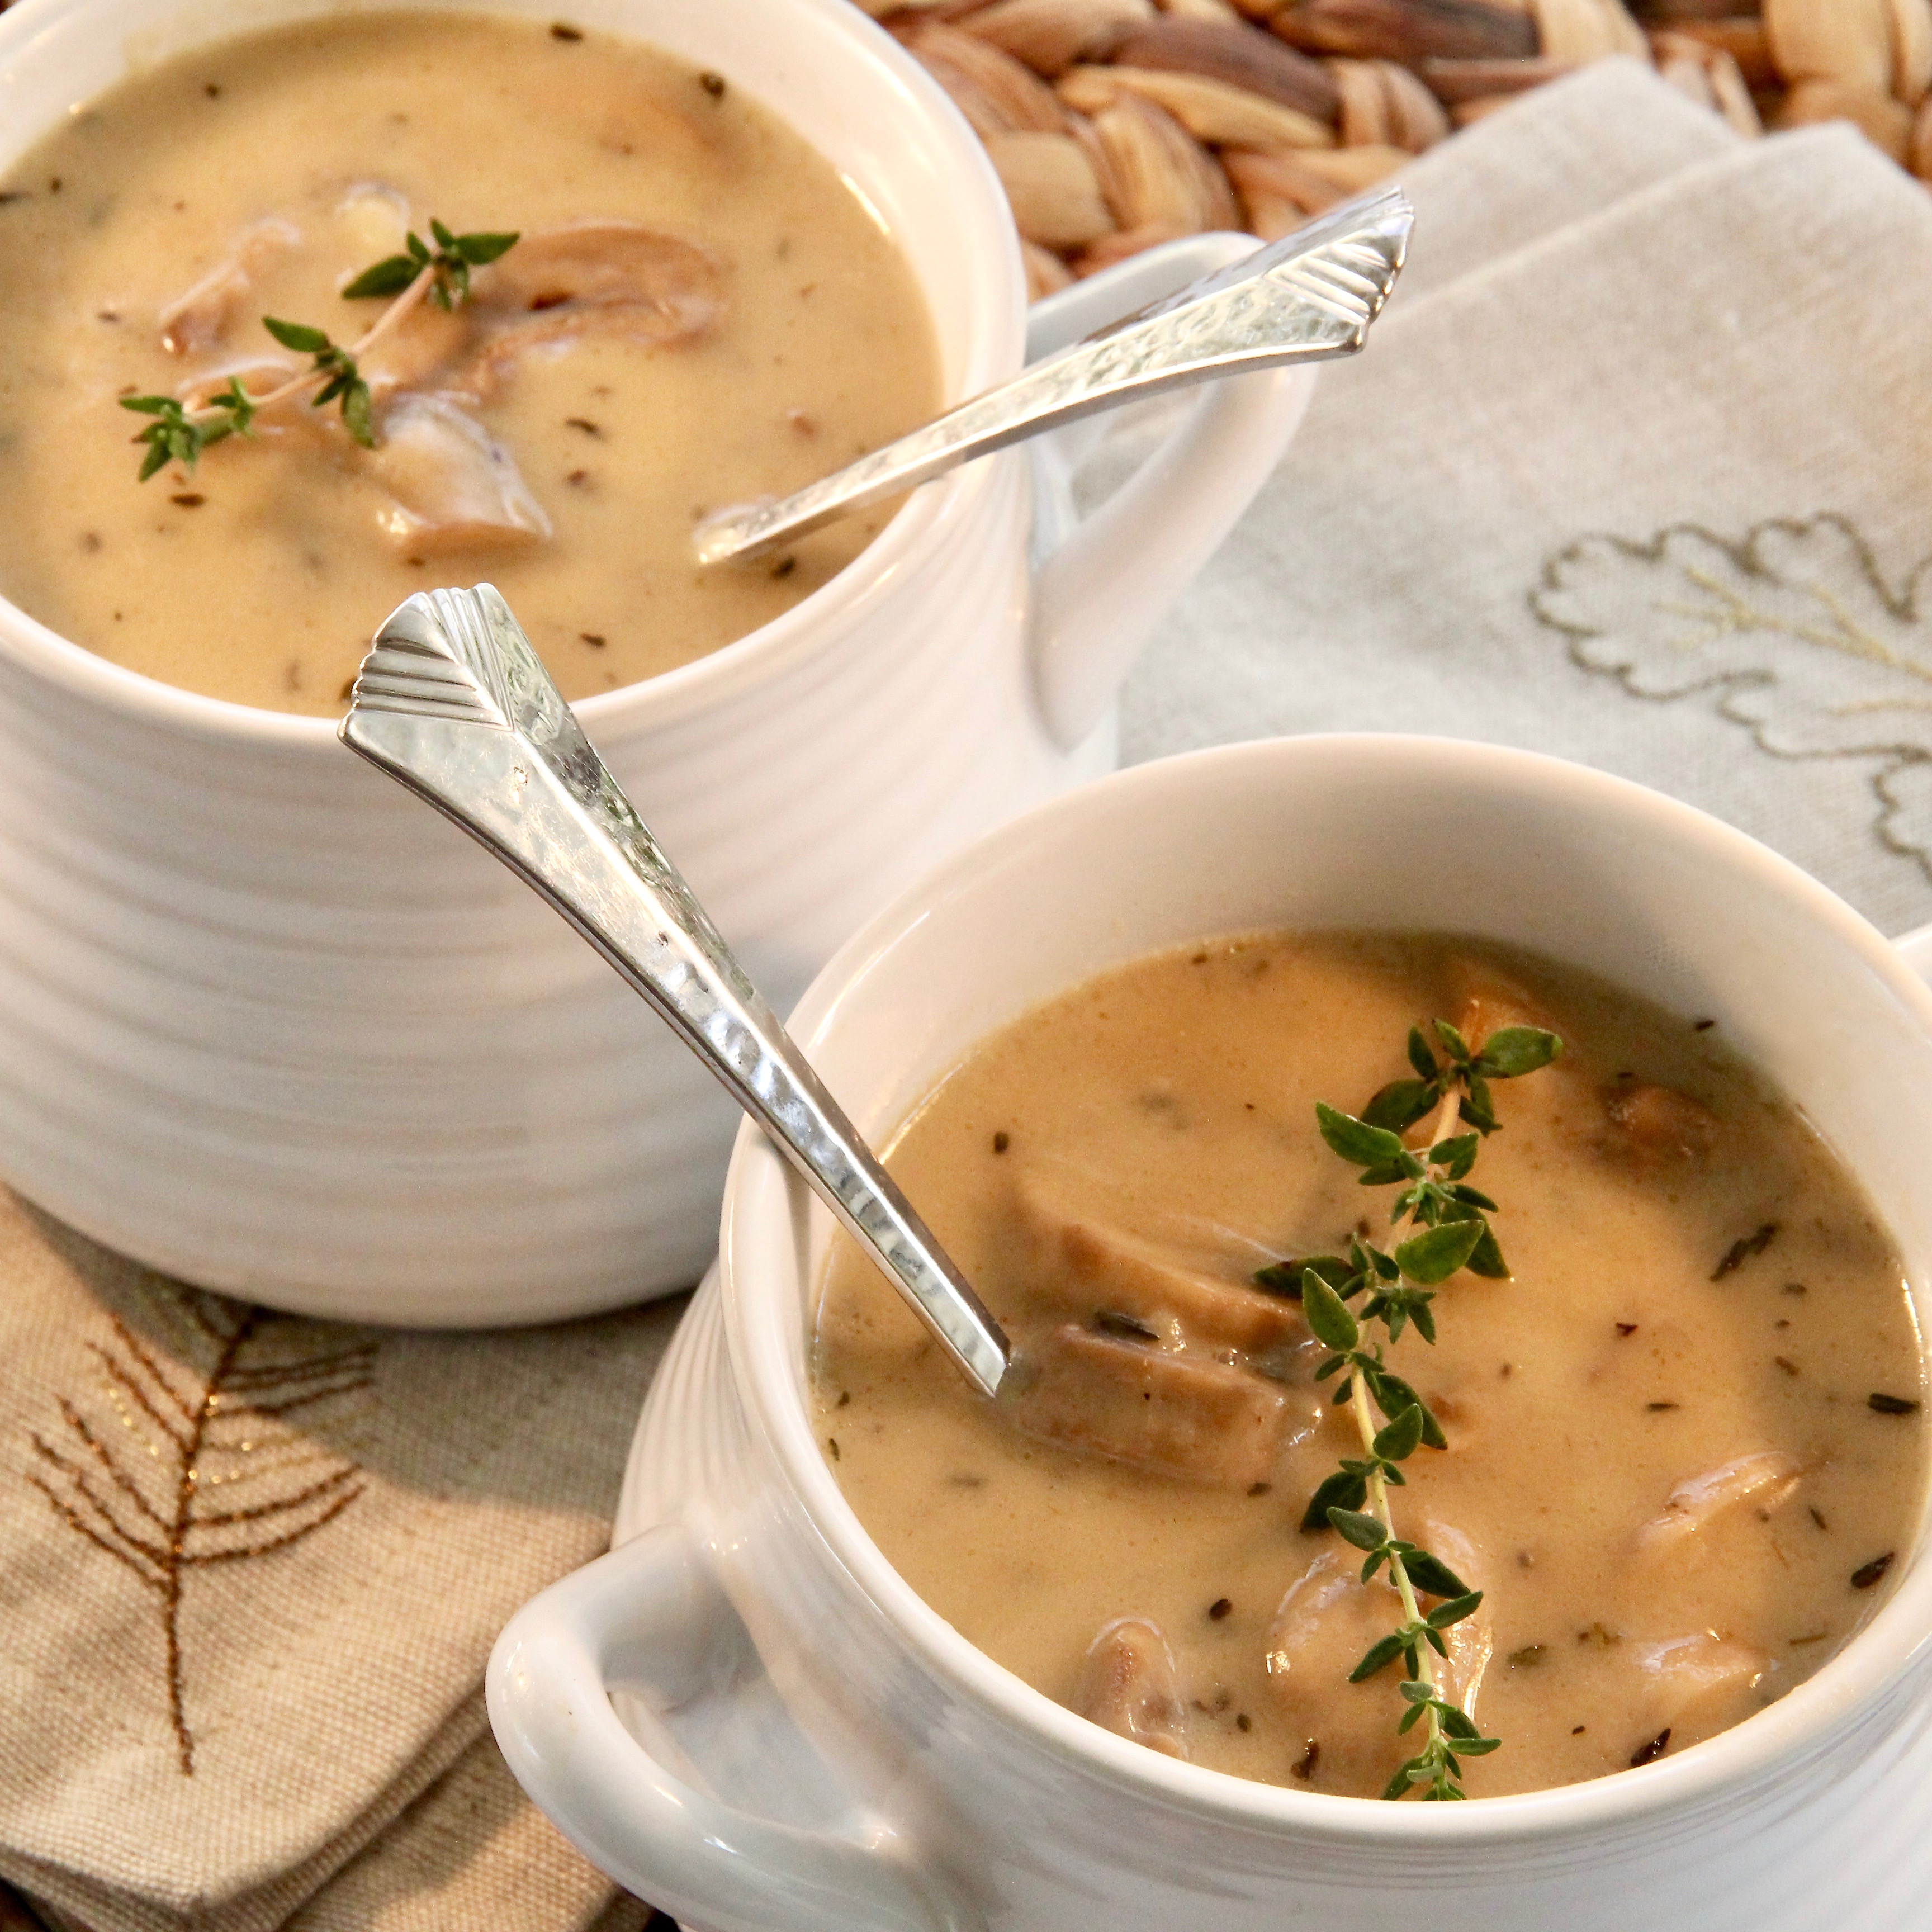 Instant Pot® Creamy Mushroom Soup